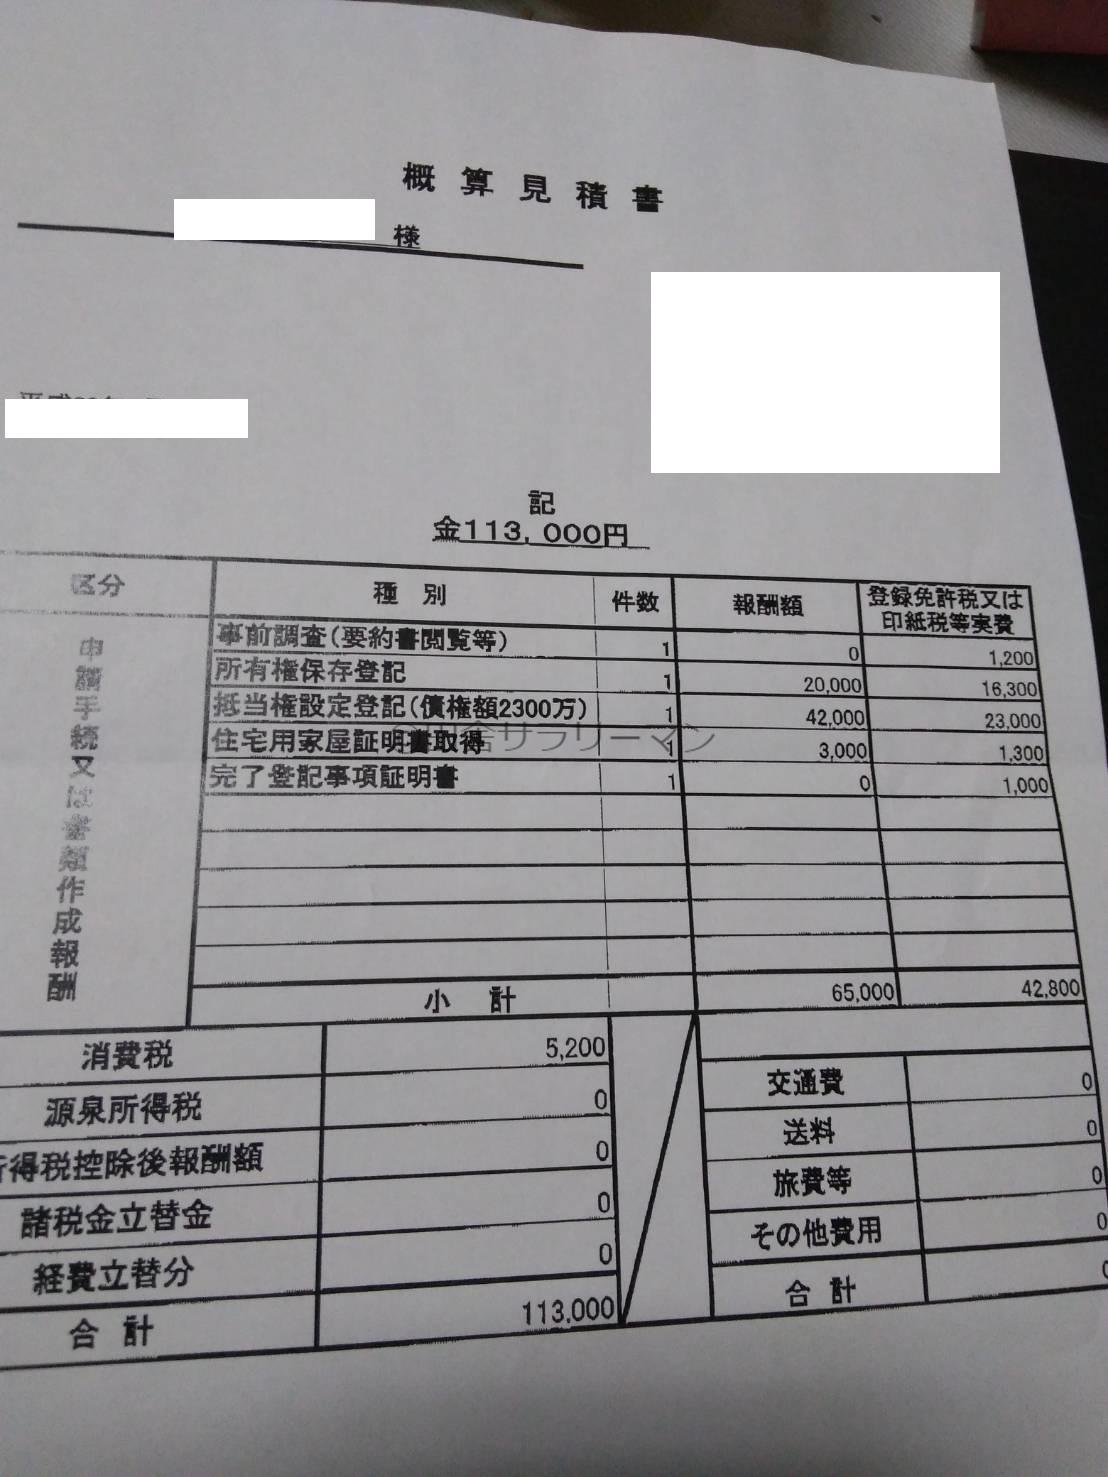 登記費用の見積書